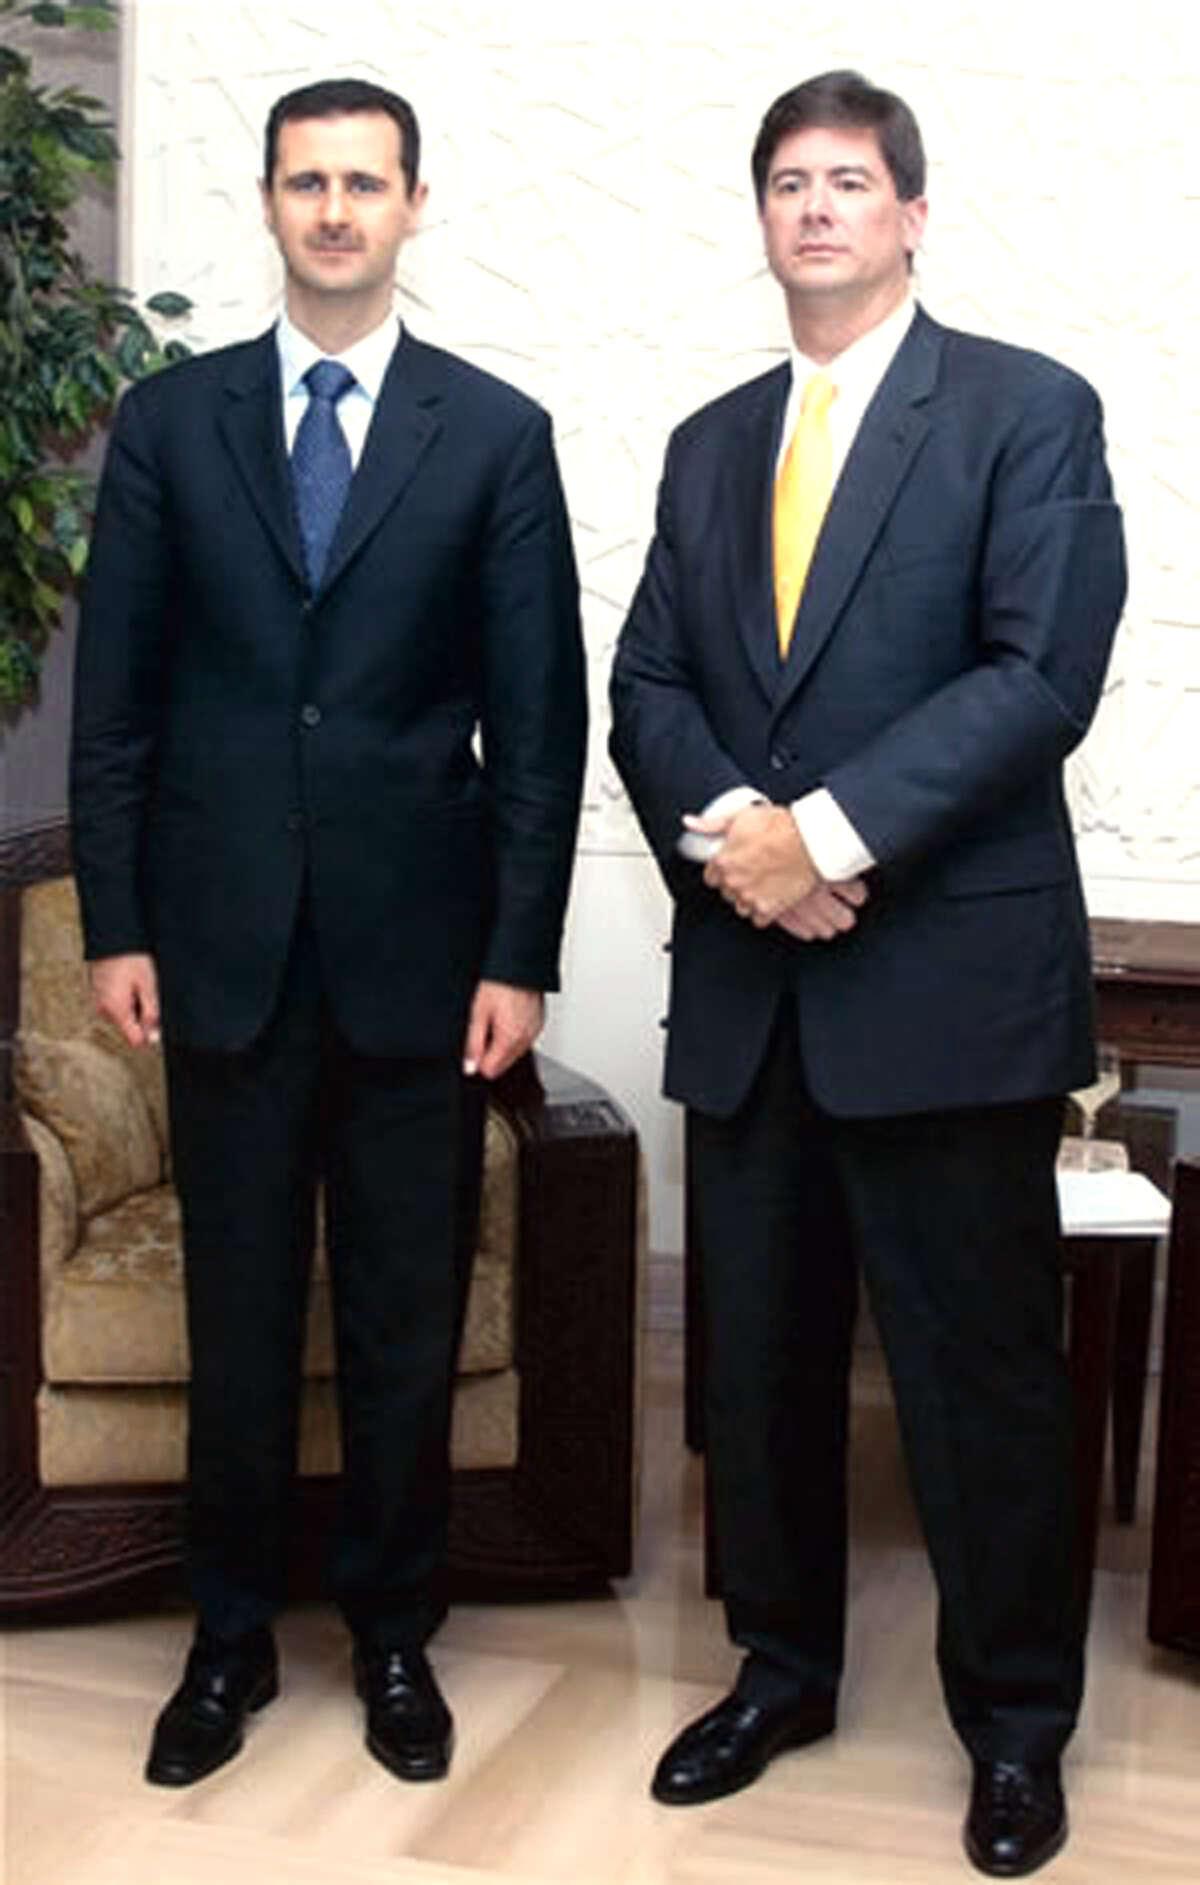 Syrian president Bashar al-Asad (left) meets with Trinity history professor David Lesch in Damascus.